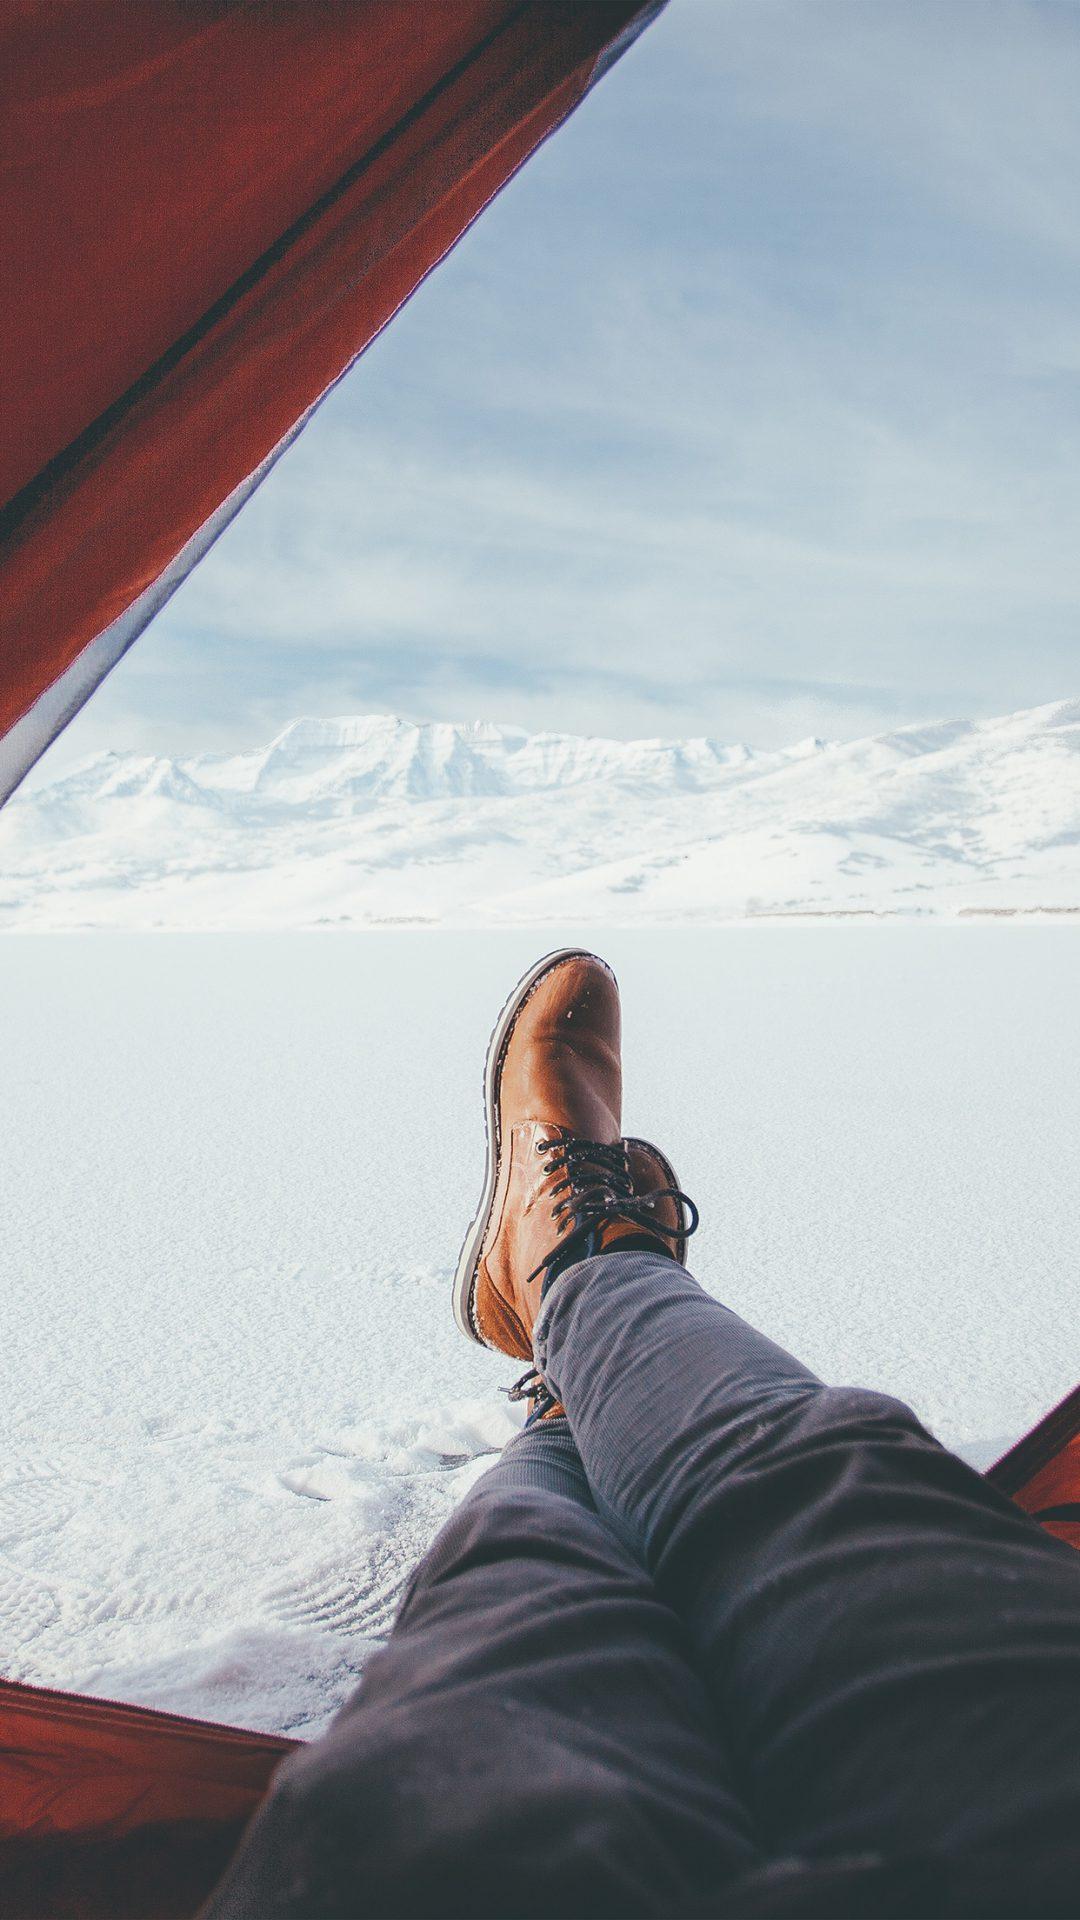 Tend Snow Artic Winter Camp Nature